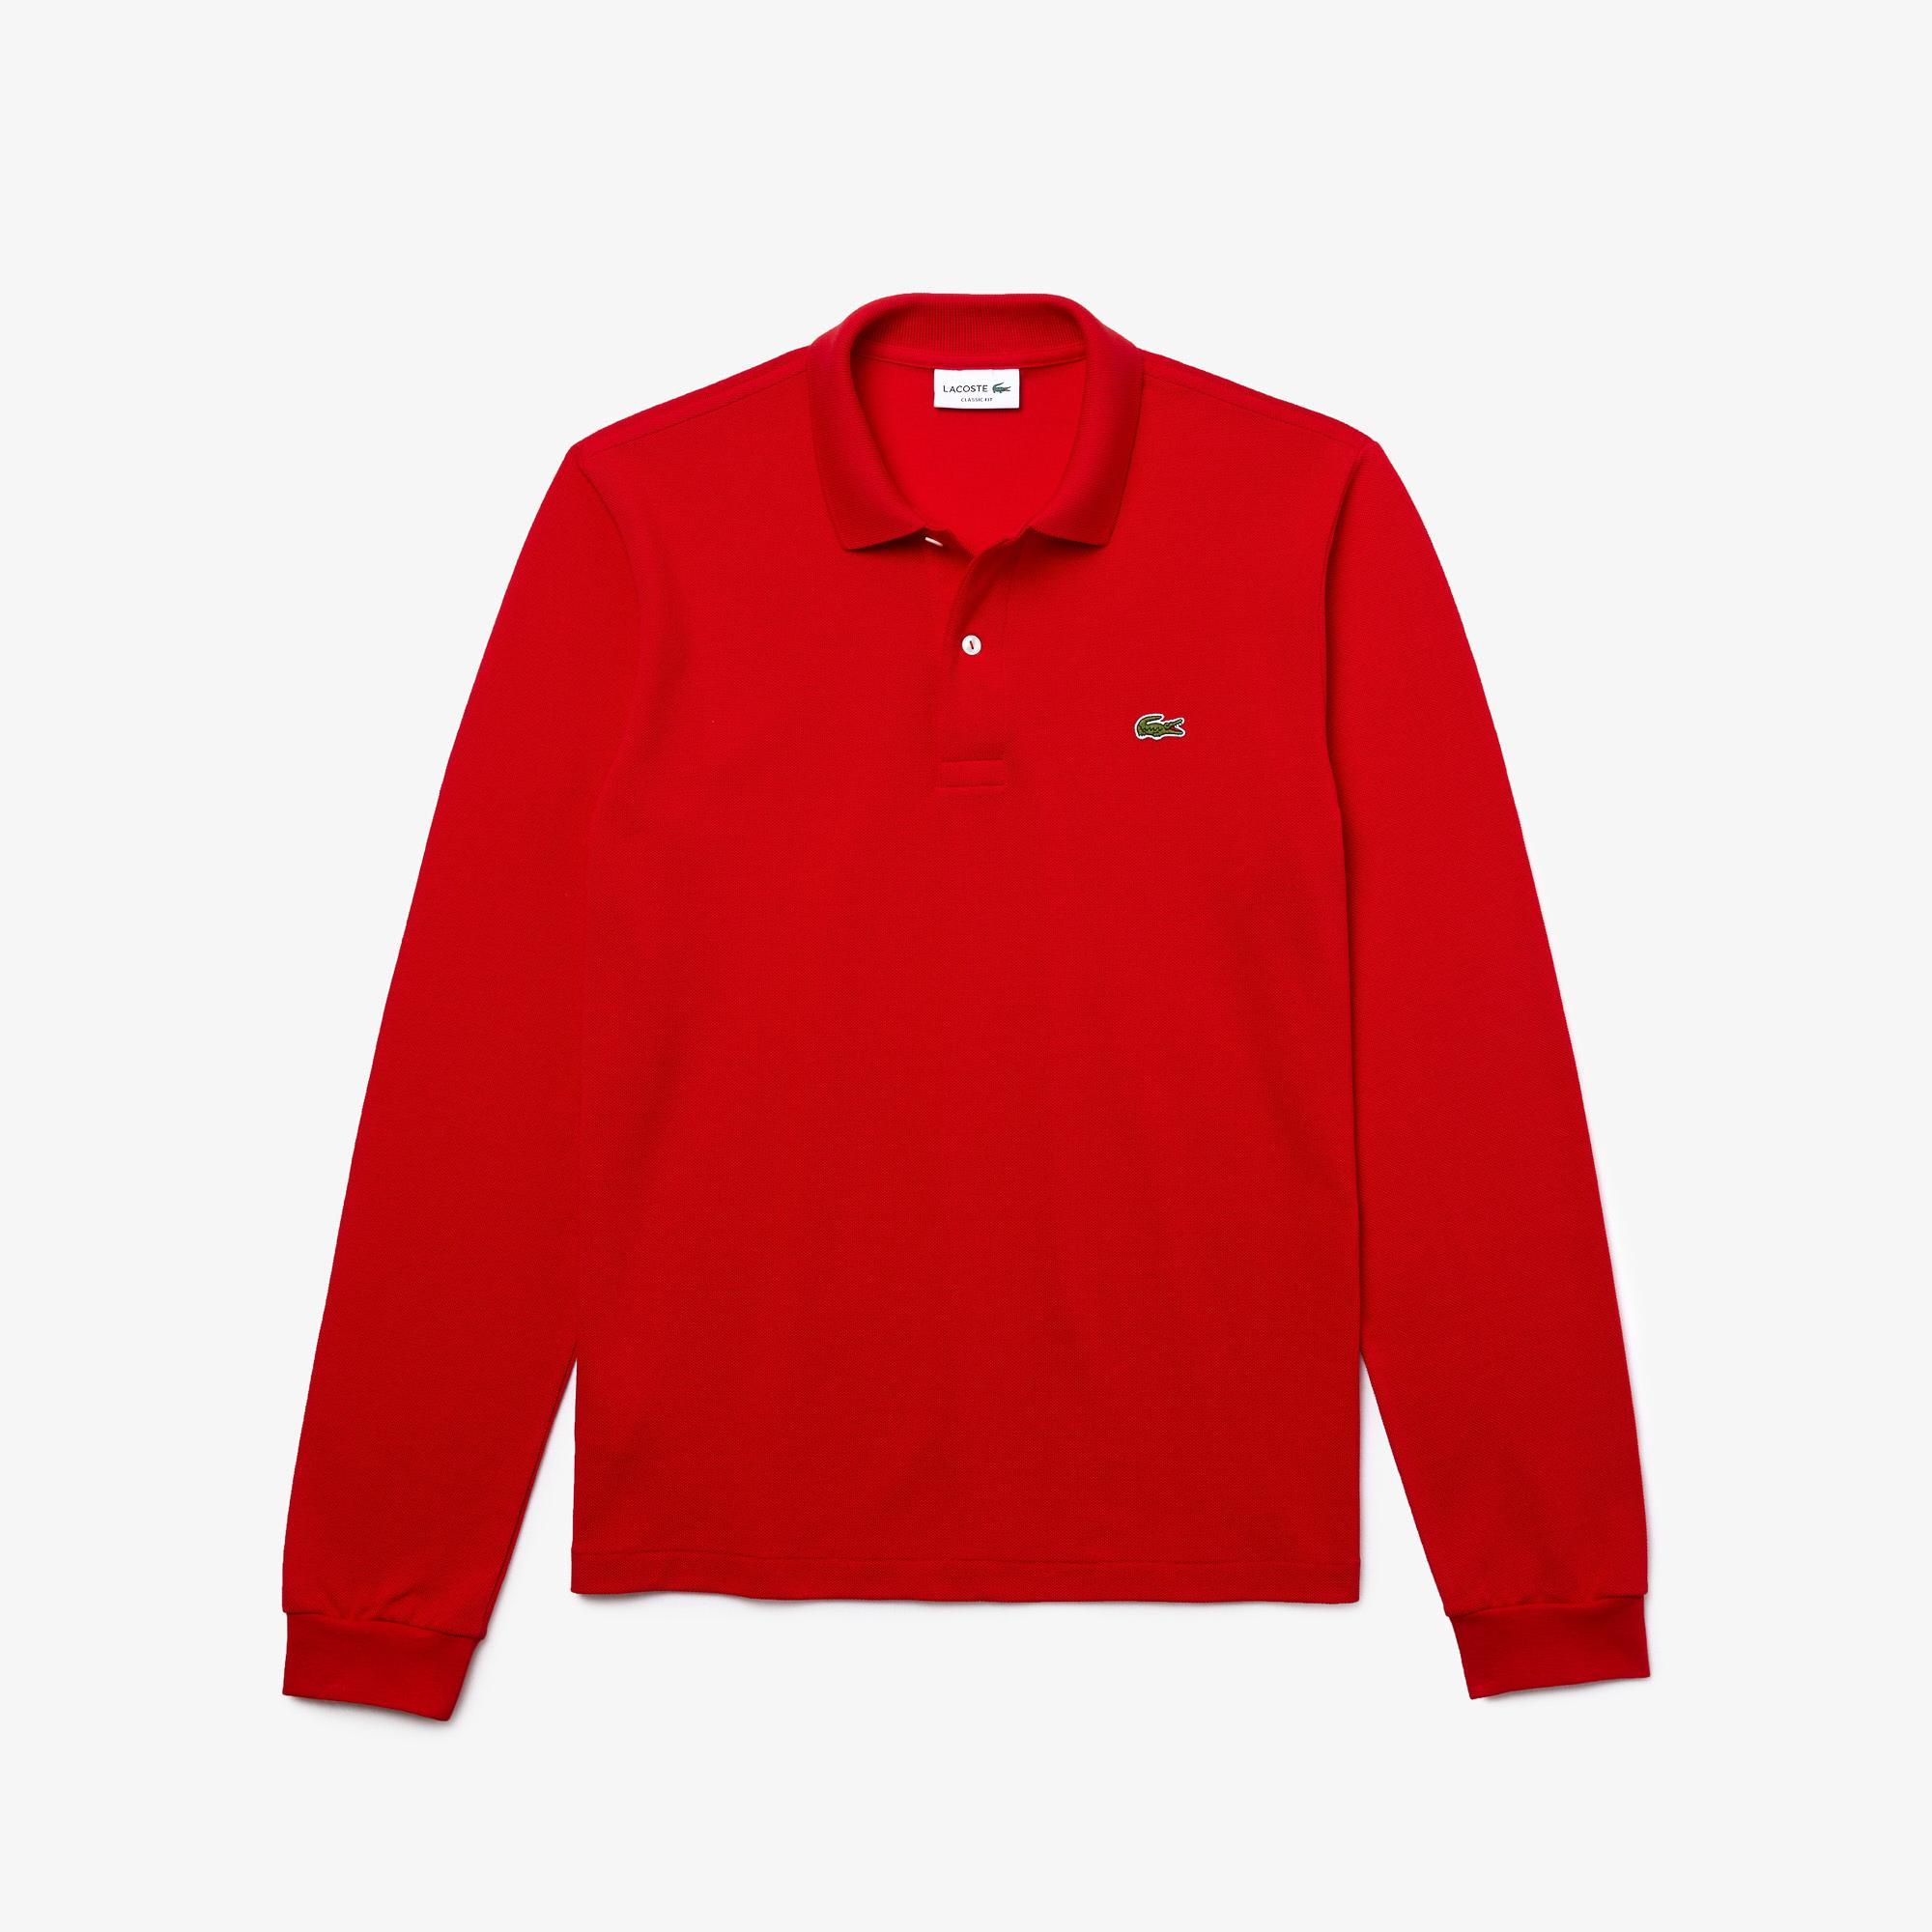 Lacoste Men's Long Sleeve Classic Fit L.13.12 Polo